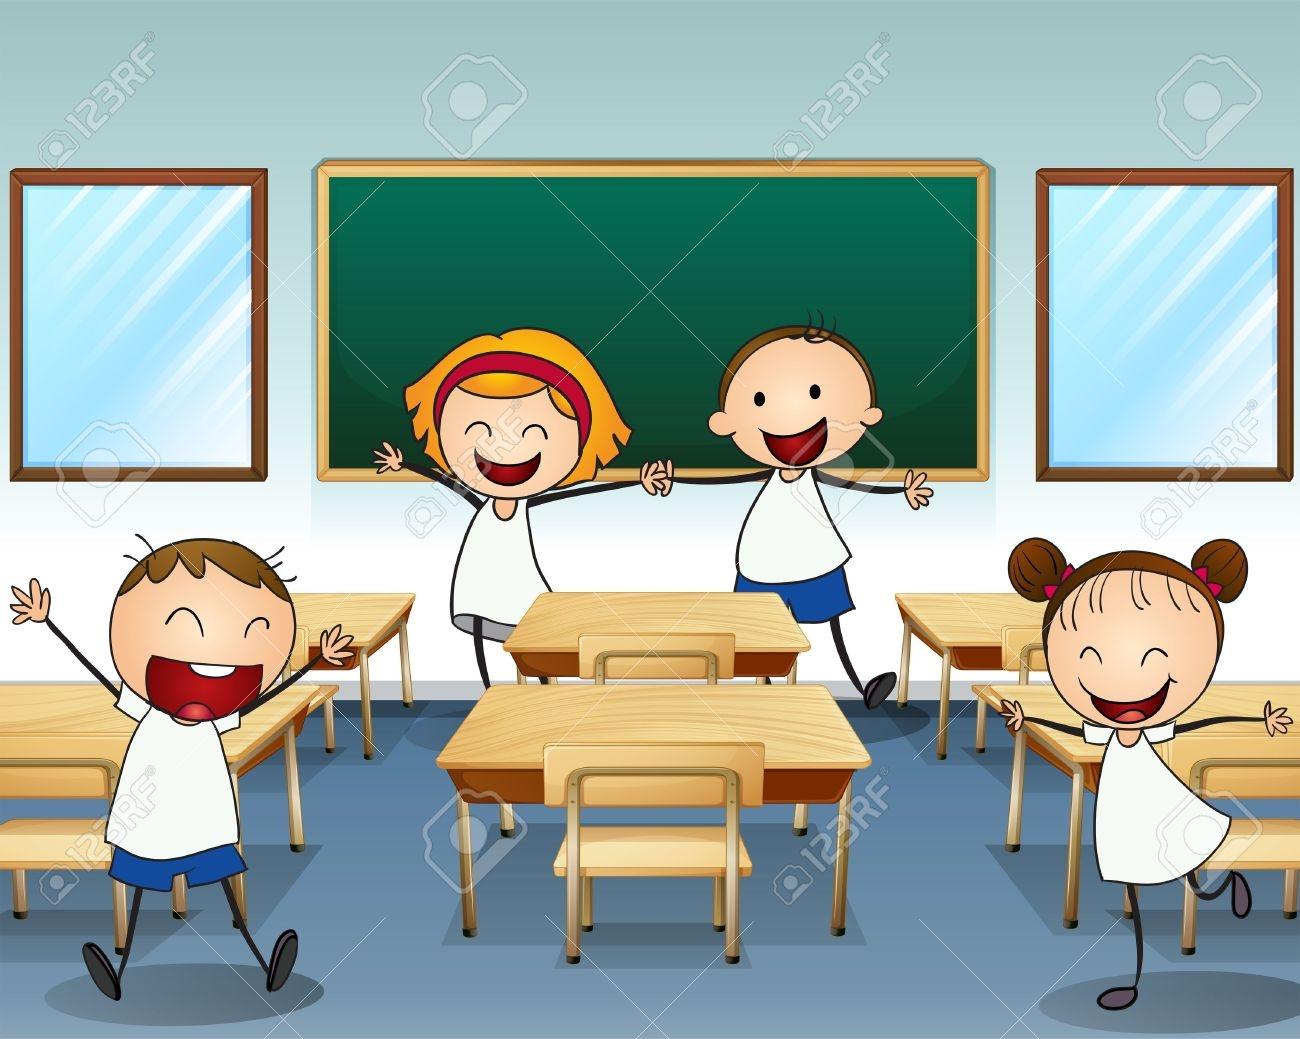 Animated Classroom Clipart - Classroomclipart